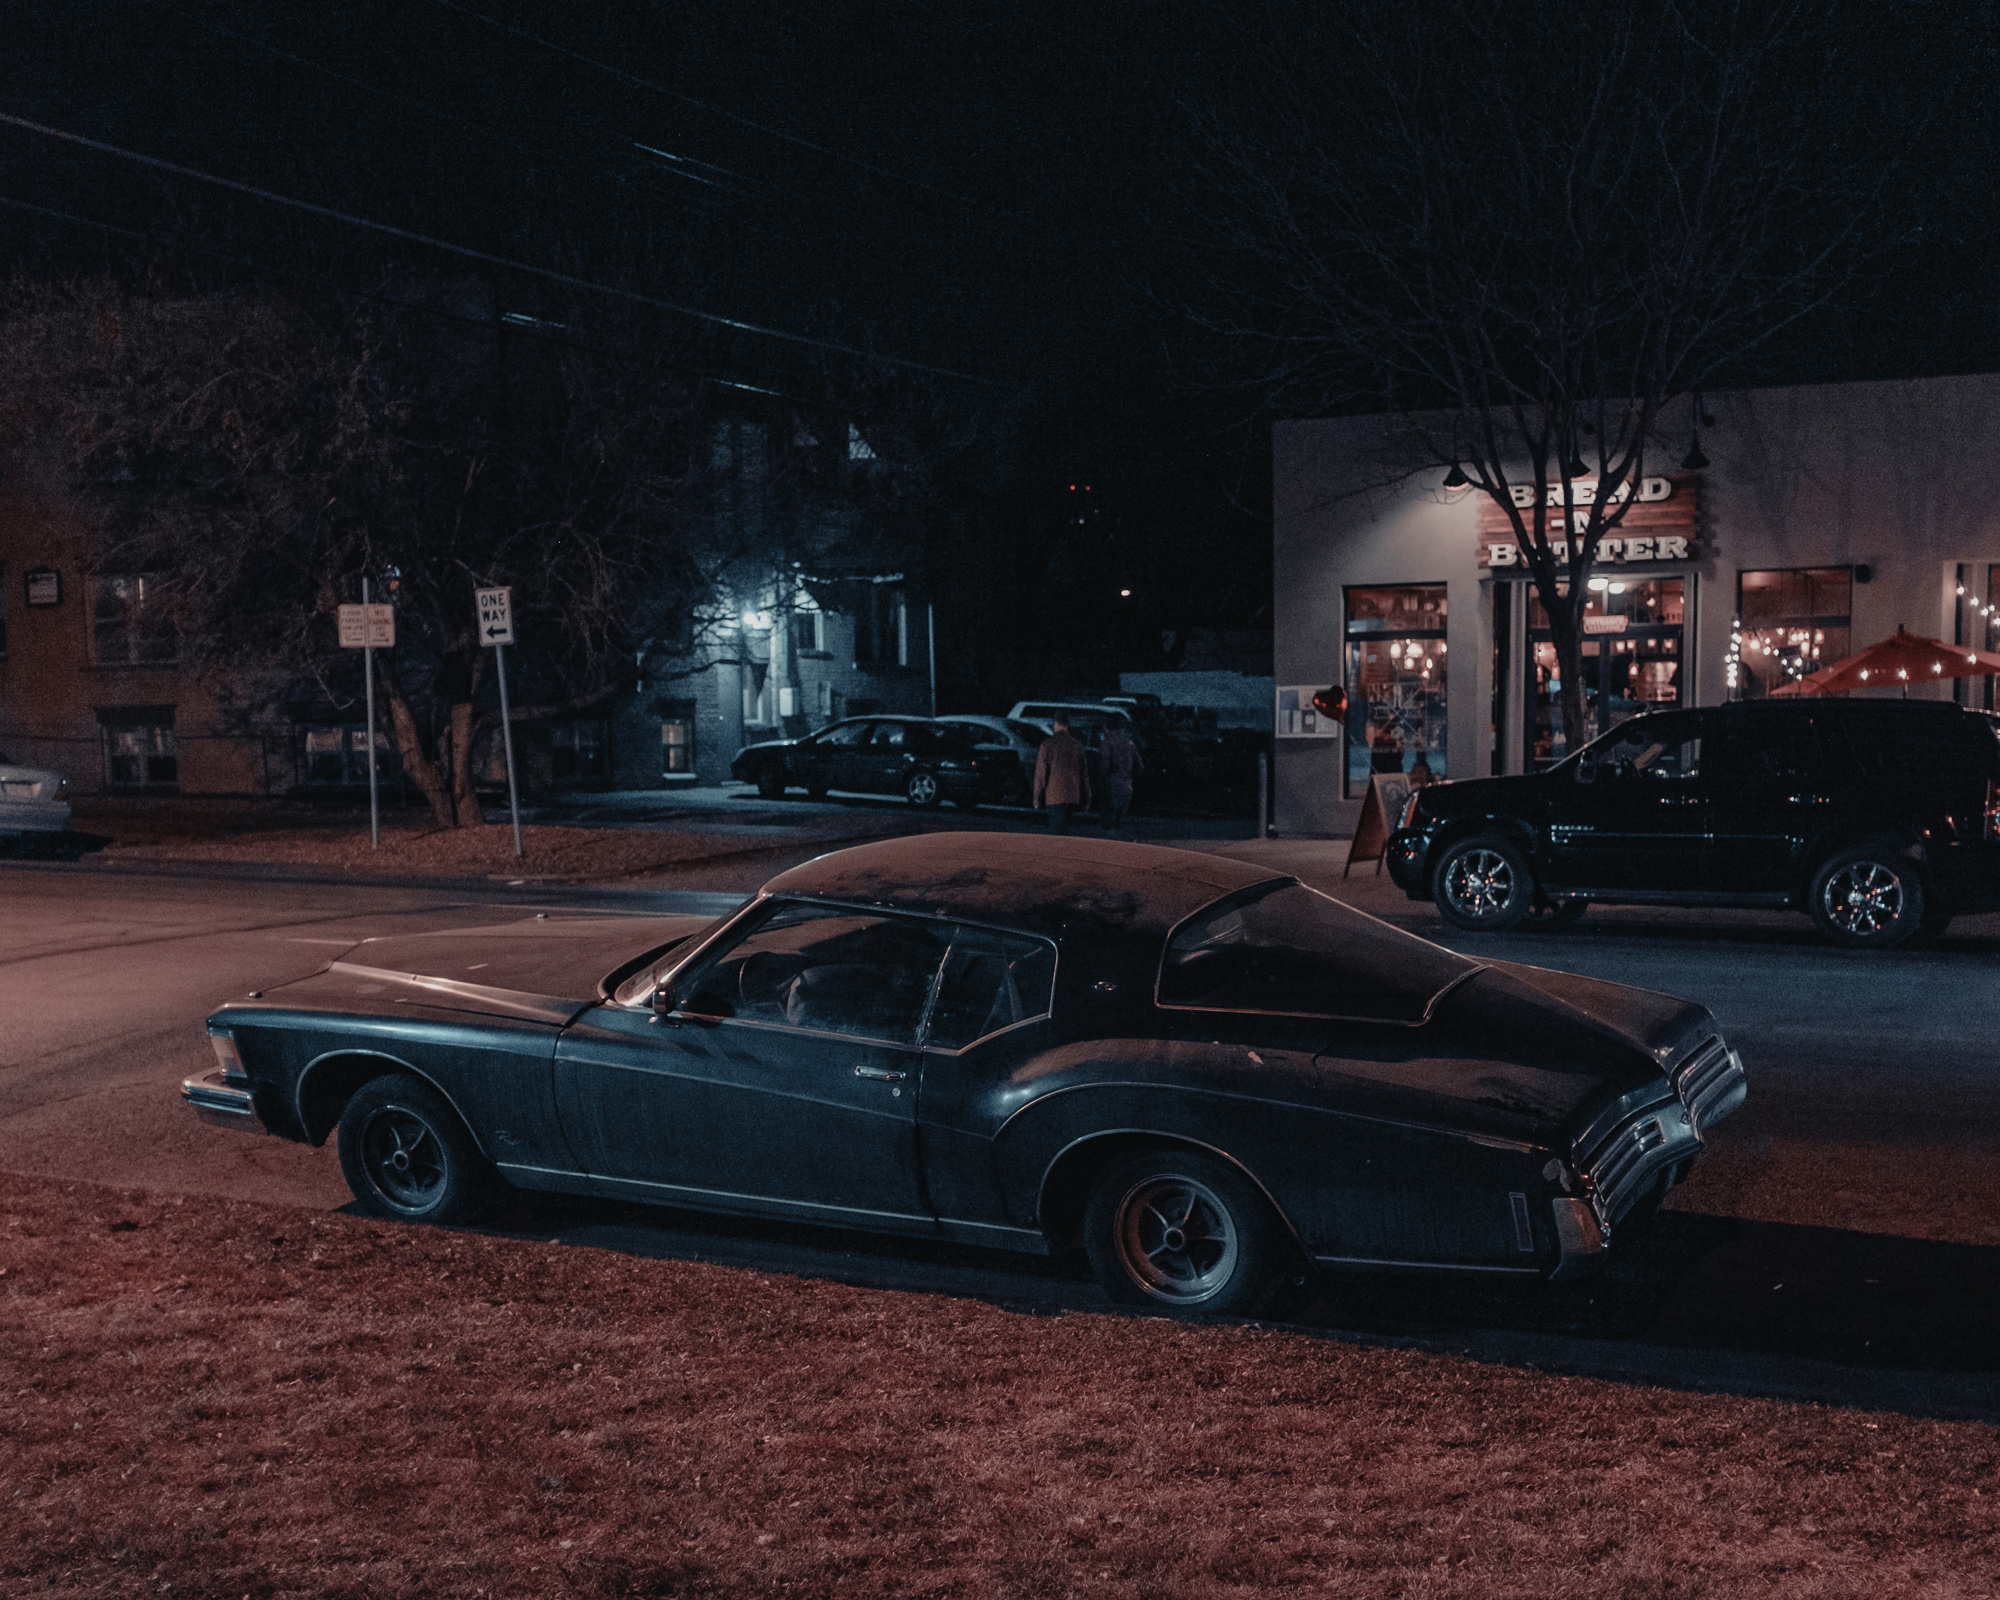 Nights-58.jpg